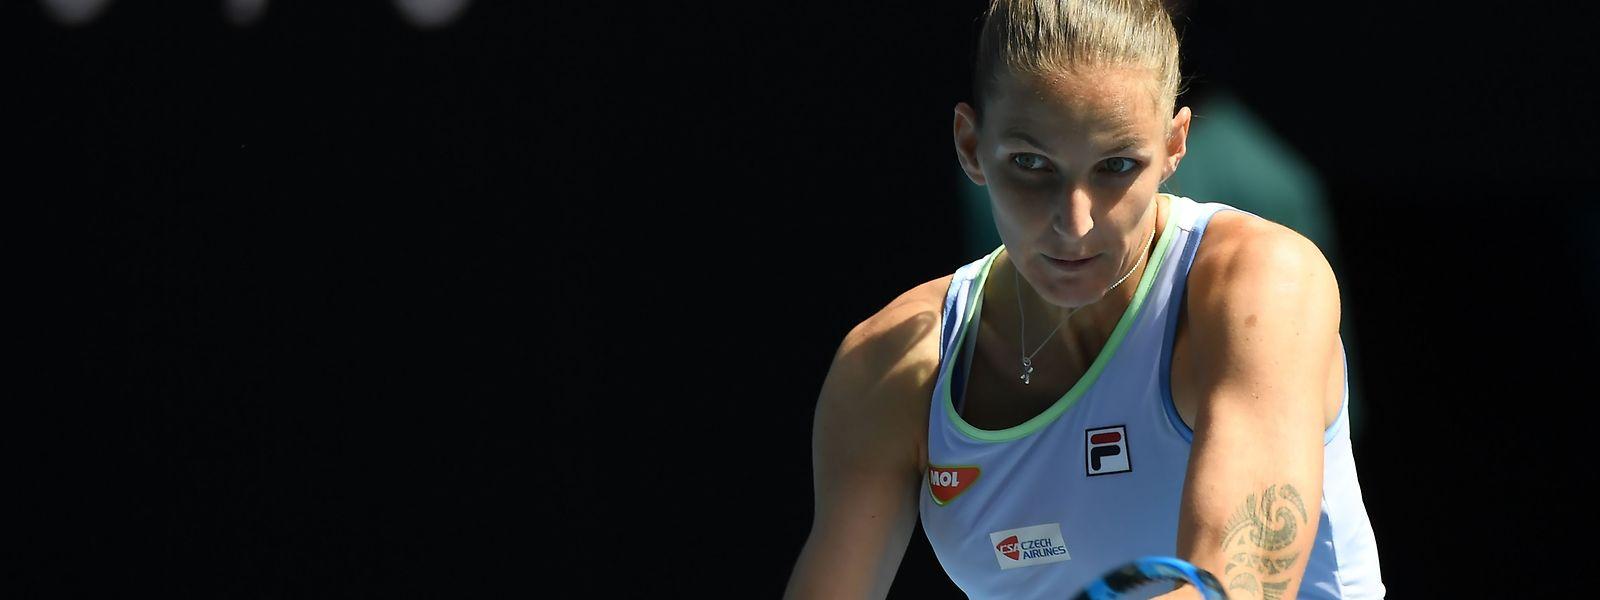 La n°2 mondiale, Karolina Pliskova n'a laissé aucune chance à la Française Kristina Mladenovic